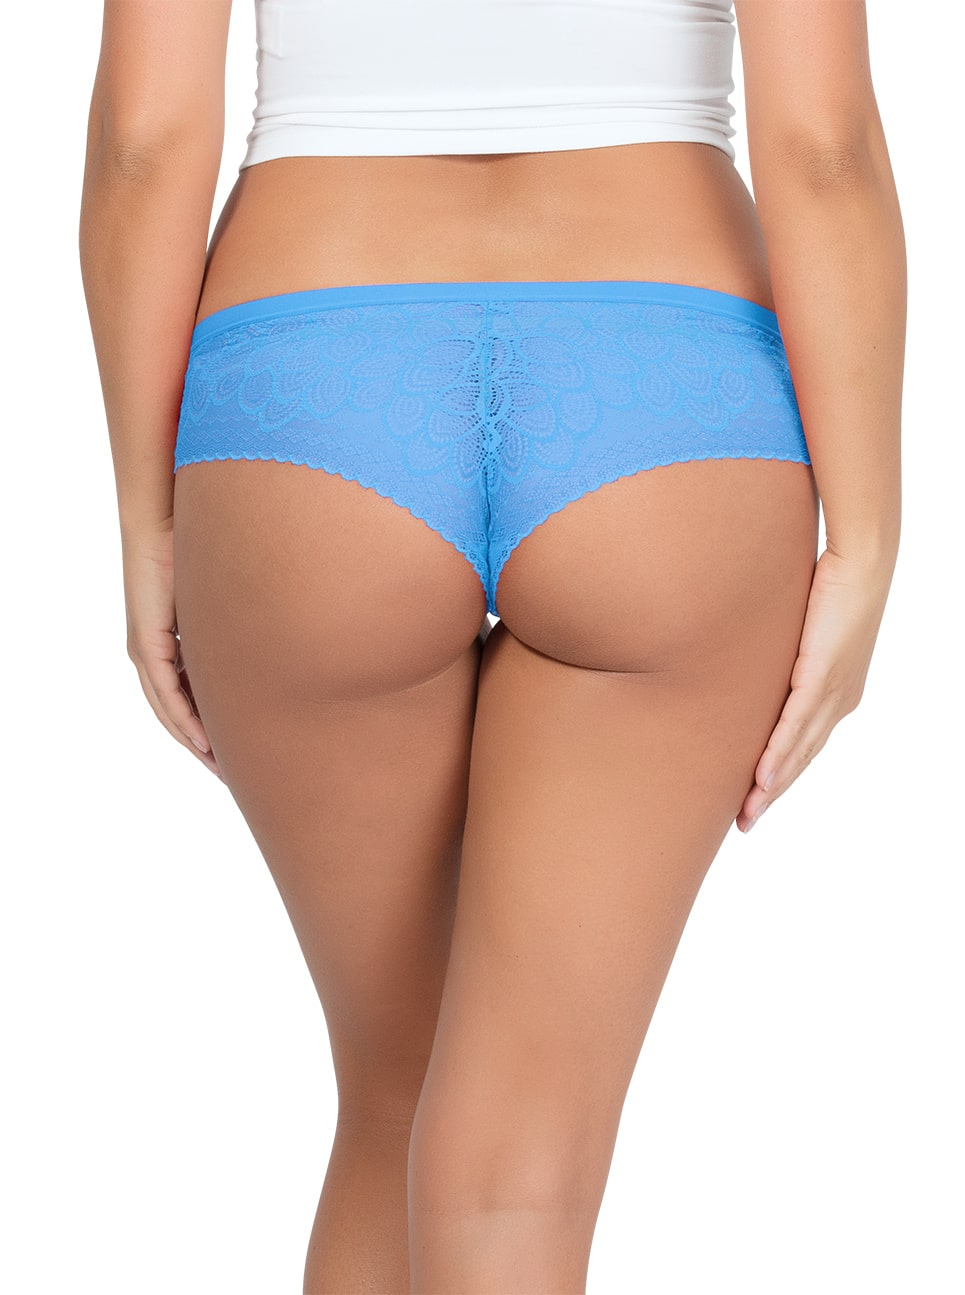 ParfaitPanty SoGlam HIPSTERPP502 MediterraneanBlue BACK 1 - Parfait Panty So Glam Hipster - Mediterranean Blue - PP502